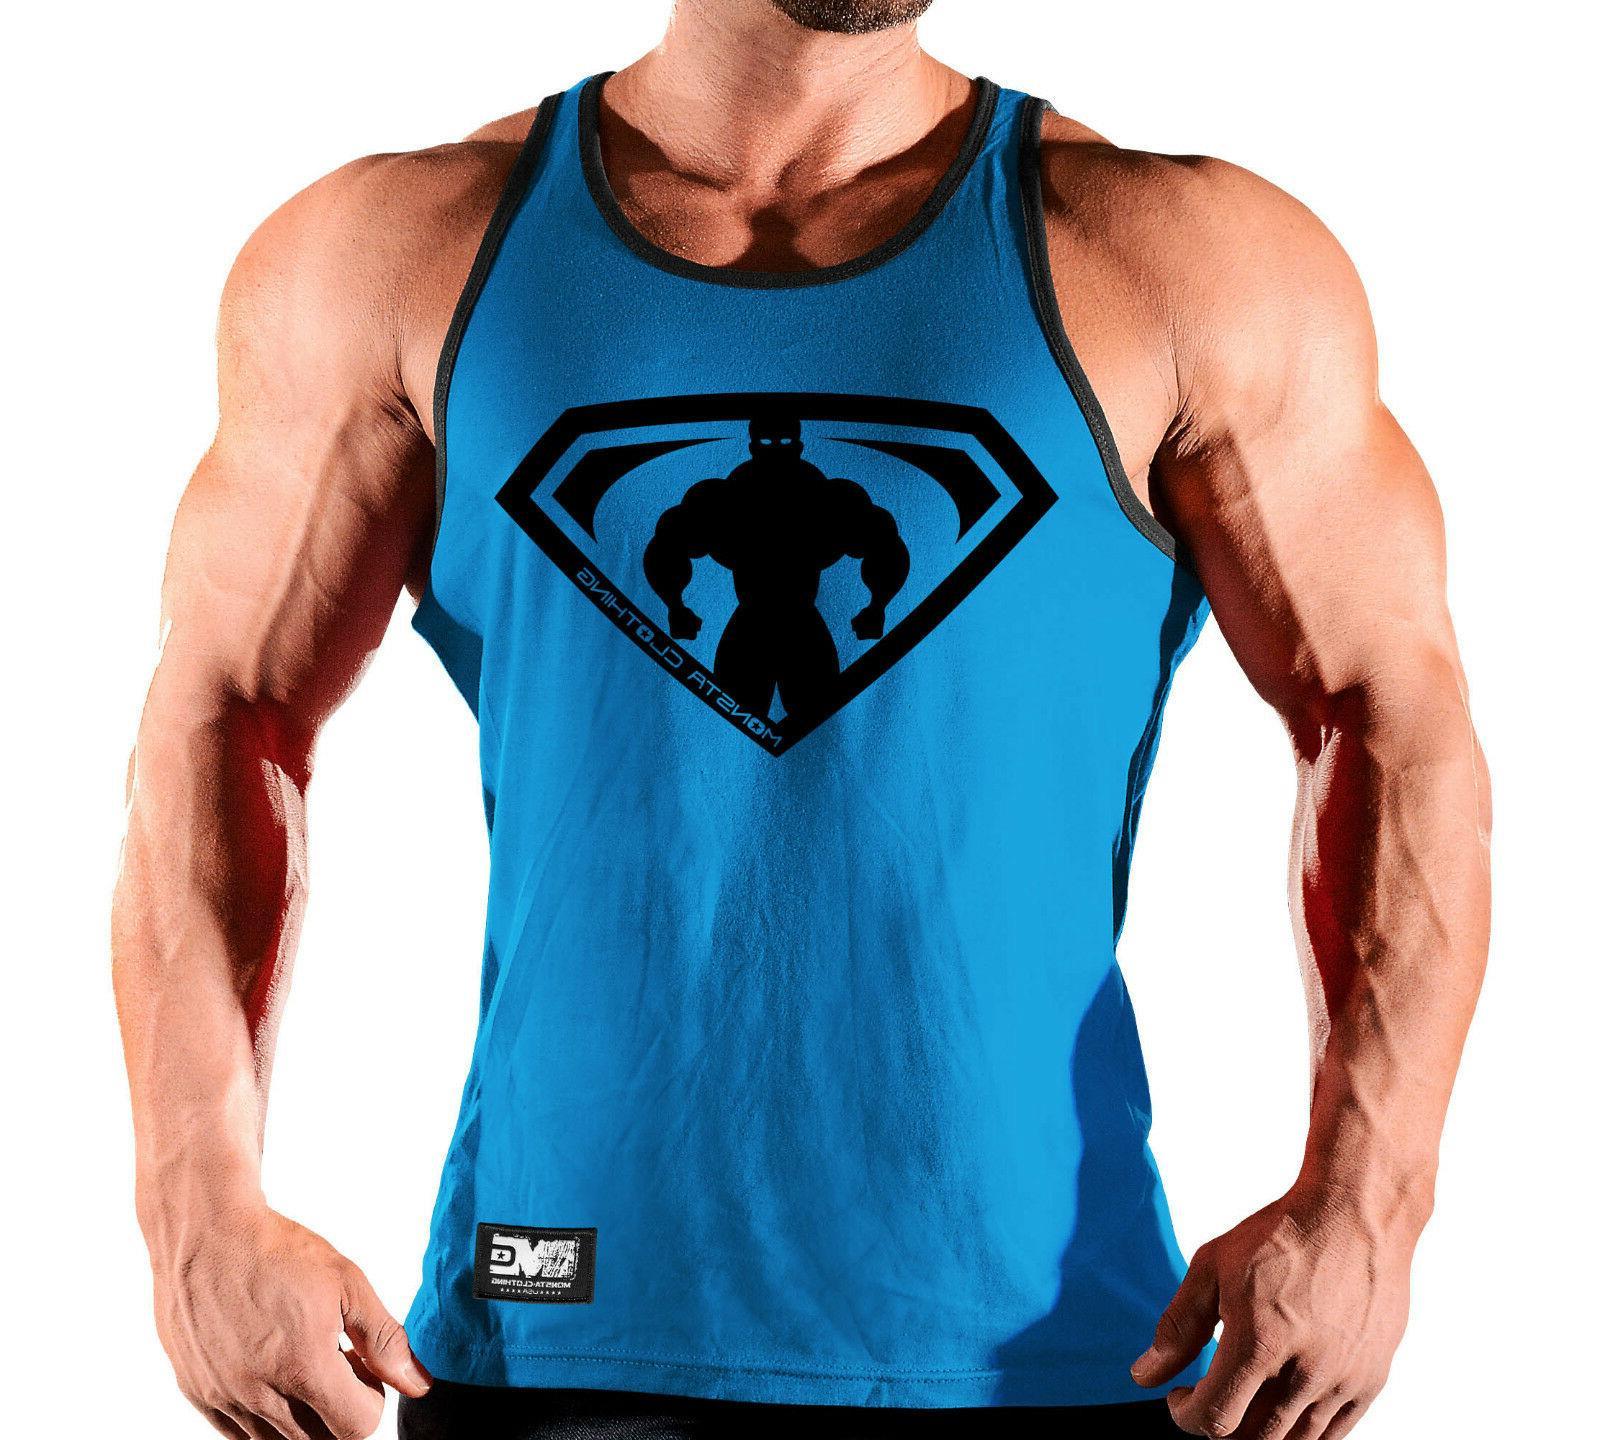 new mens monsta clothing fitness gym tank